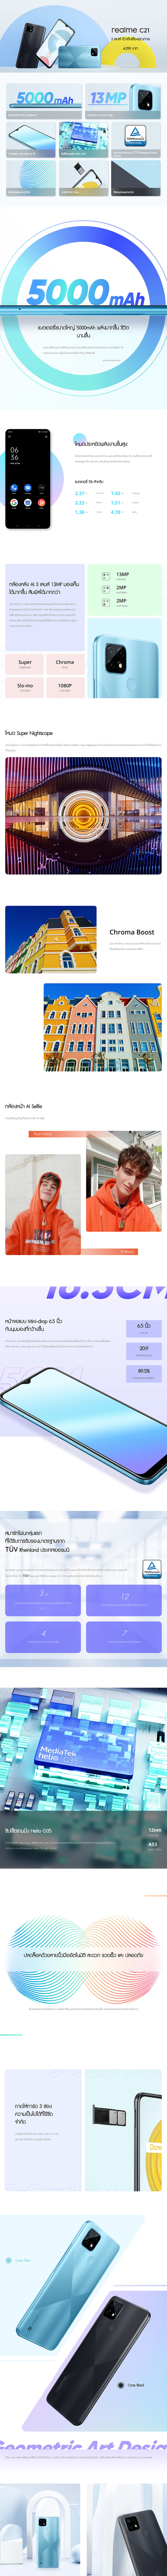 01-3000090635-feature.jpg